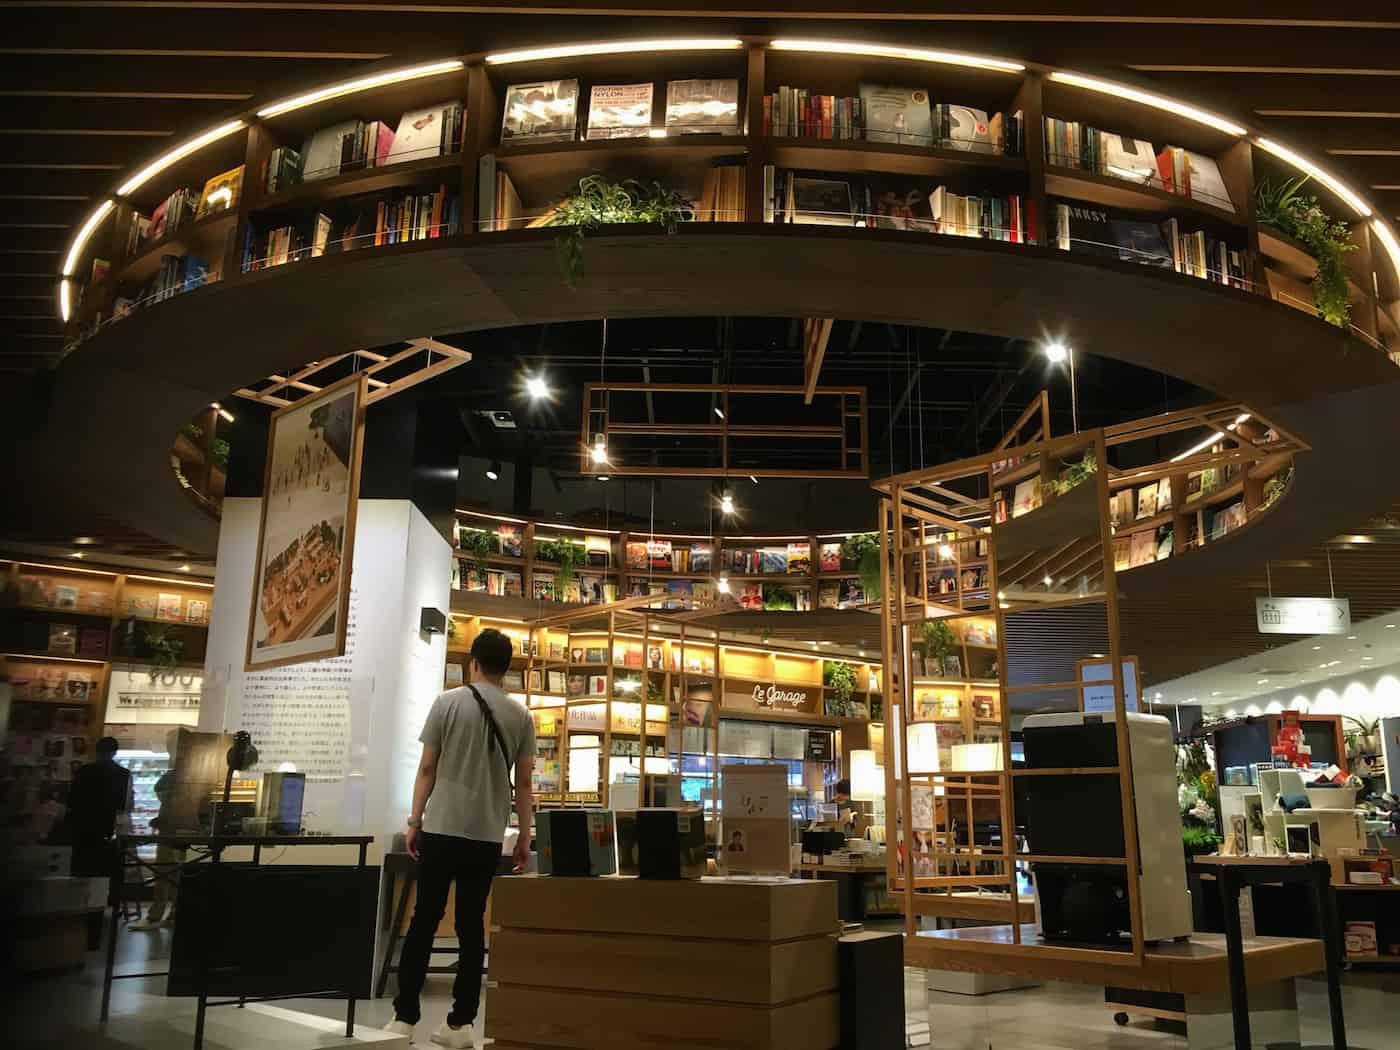 Edion Tsutaya Kaden cool electronics and book store in Eki City in Hiroshima